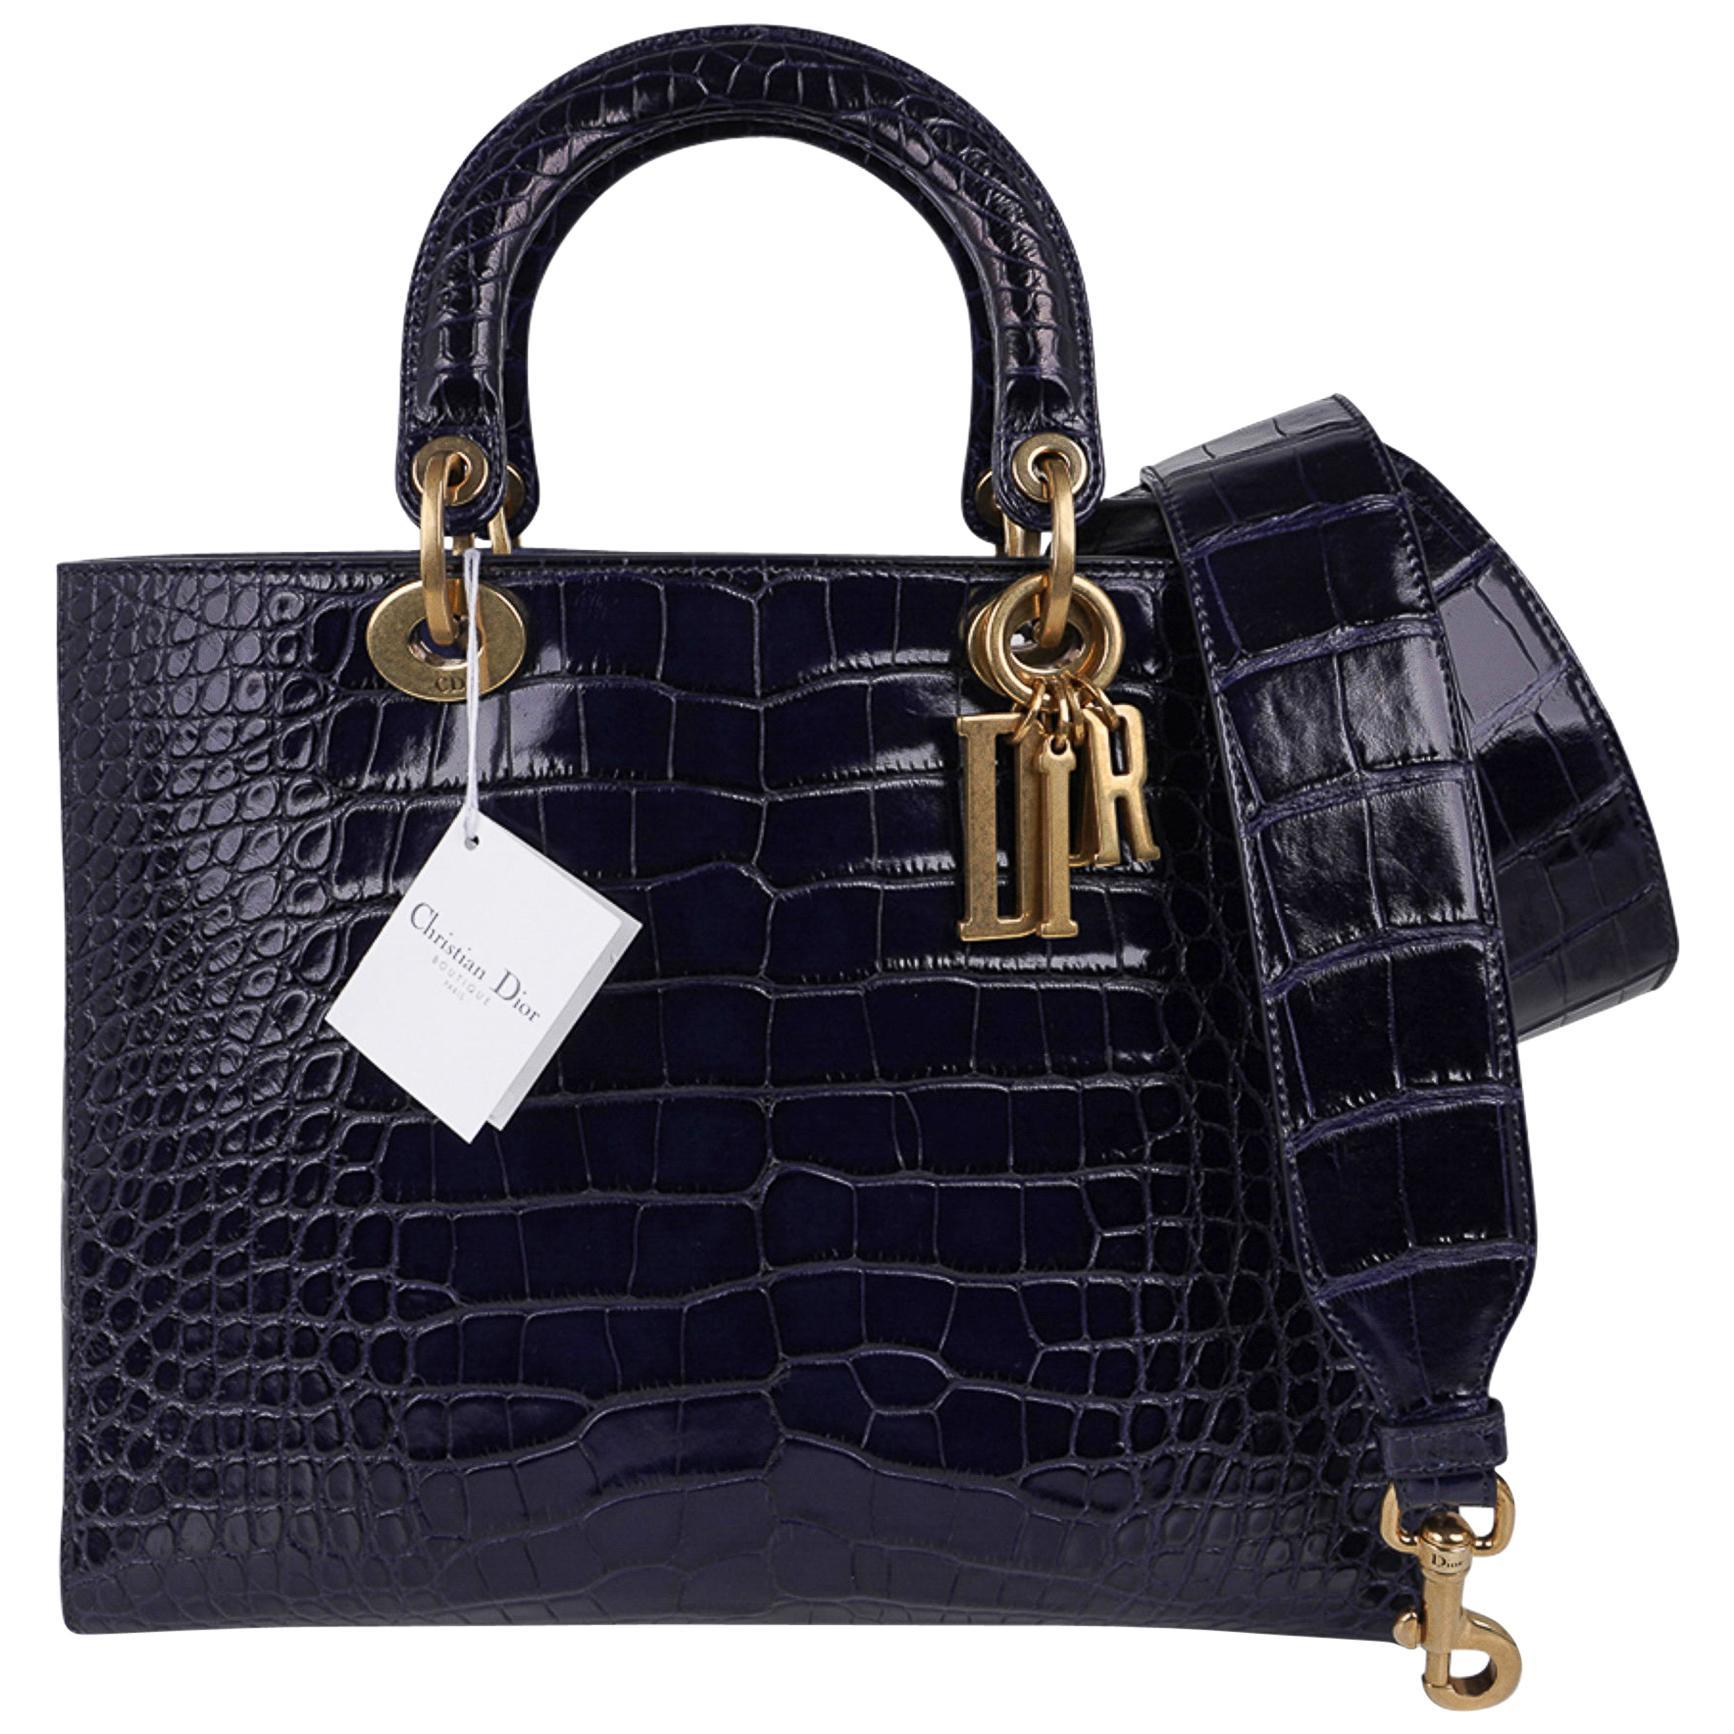 Christian Dior Bag Lady Dior Large Navy Matte Navy Alligator New w/Tag